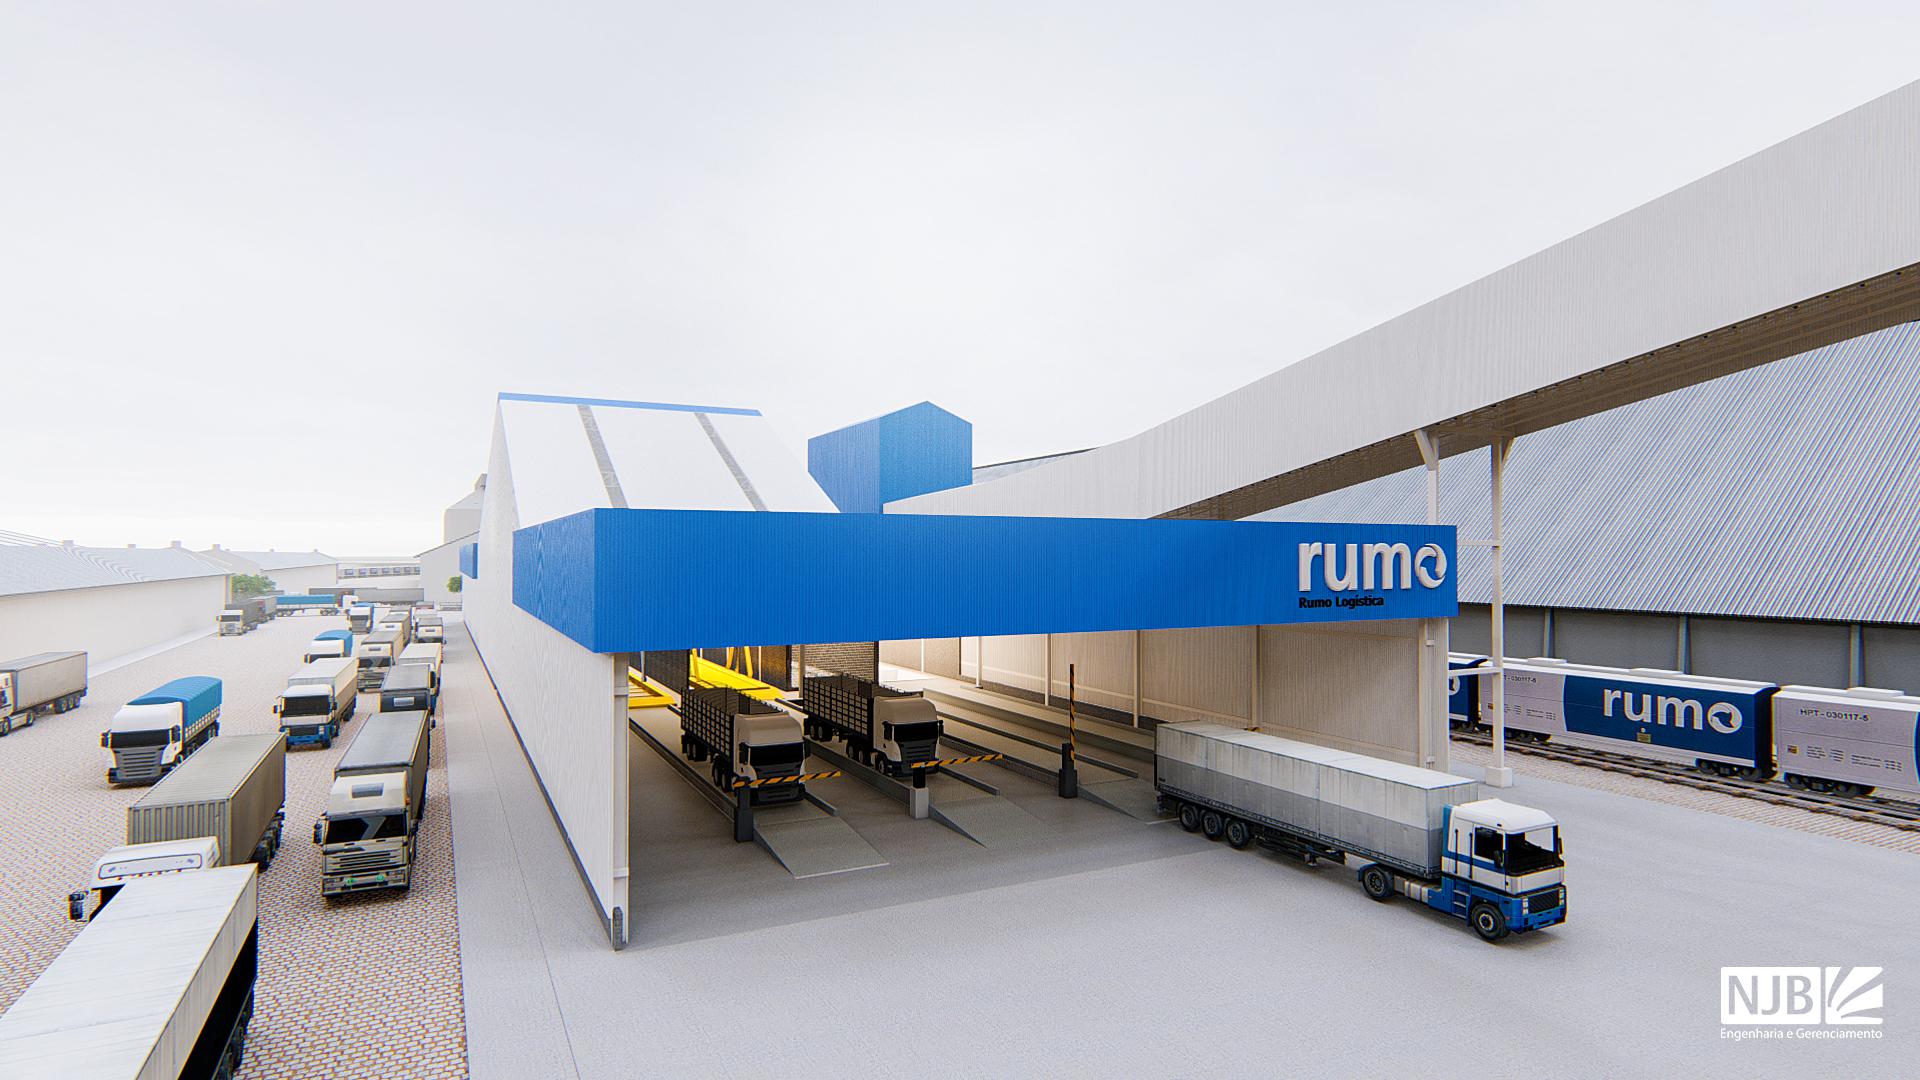 Rumo_Resultado_02161